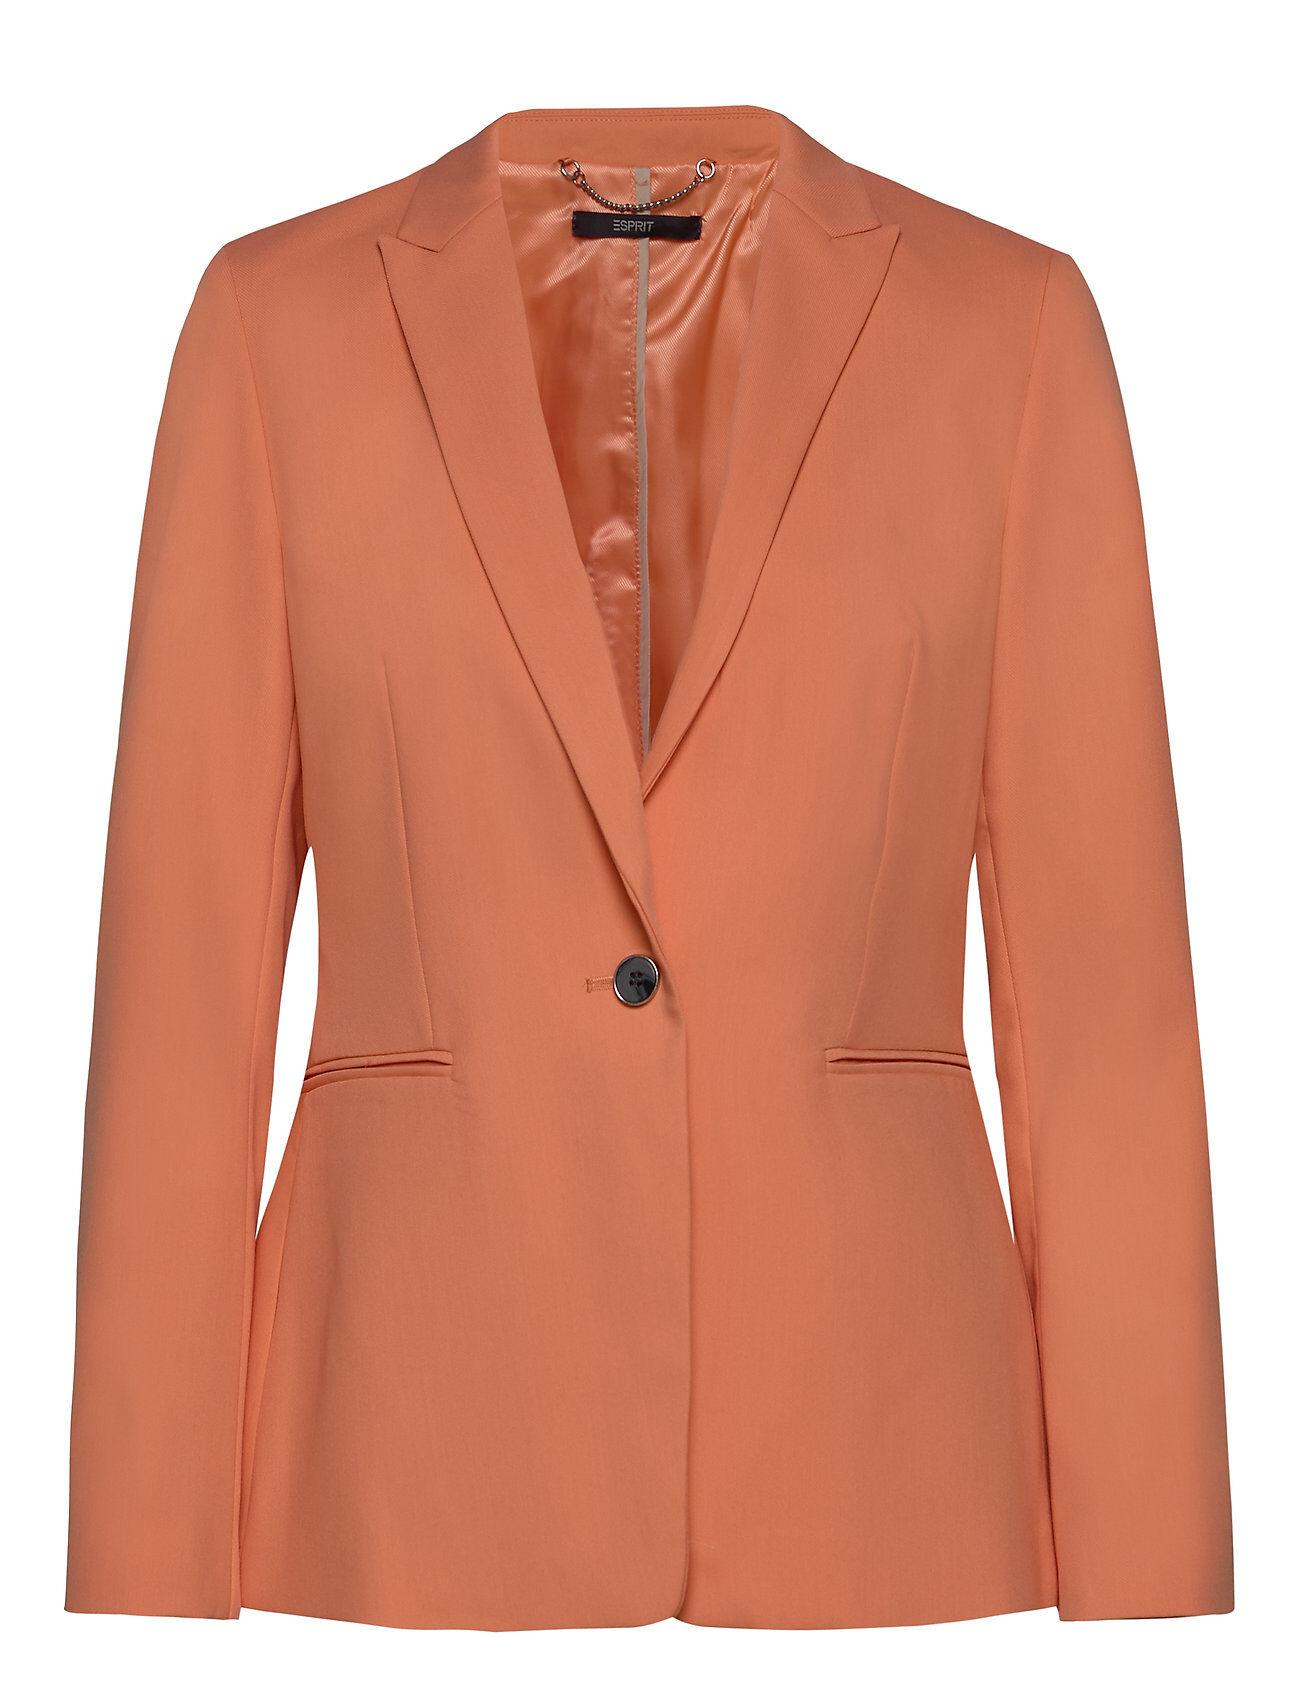 Image of Esprit Collection Blazers Woven Bleiseri Puvun Takki Oranssi Esprit Collection